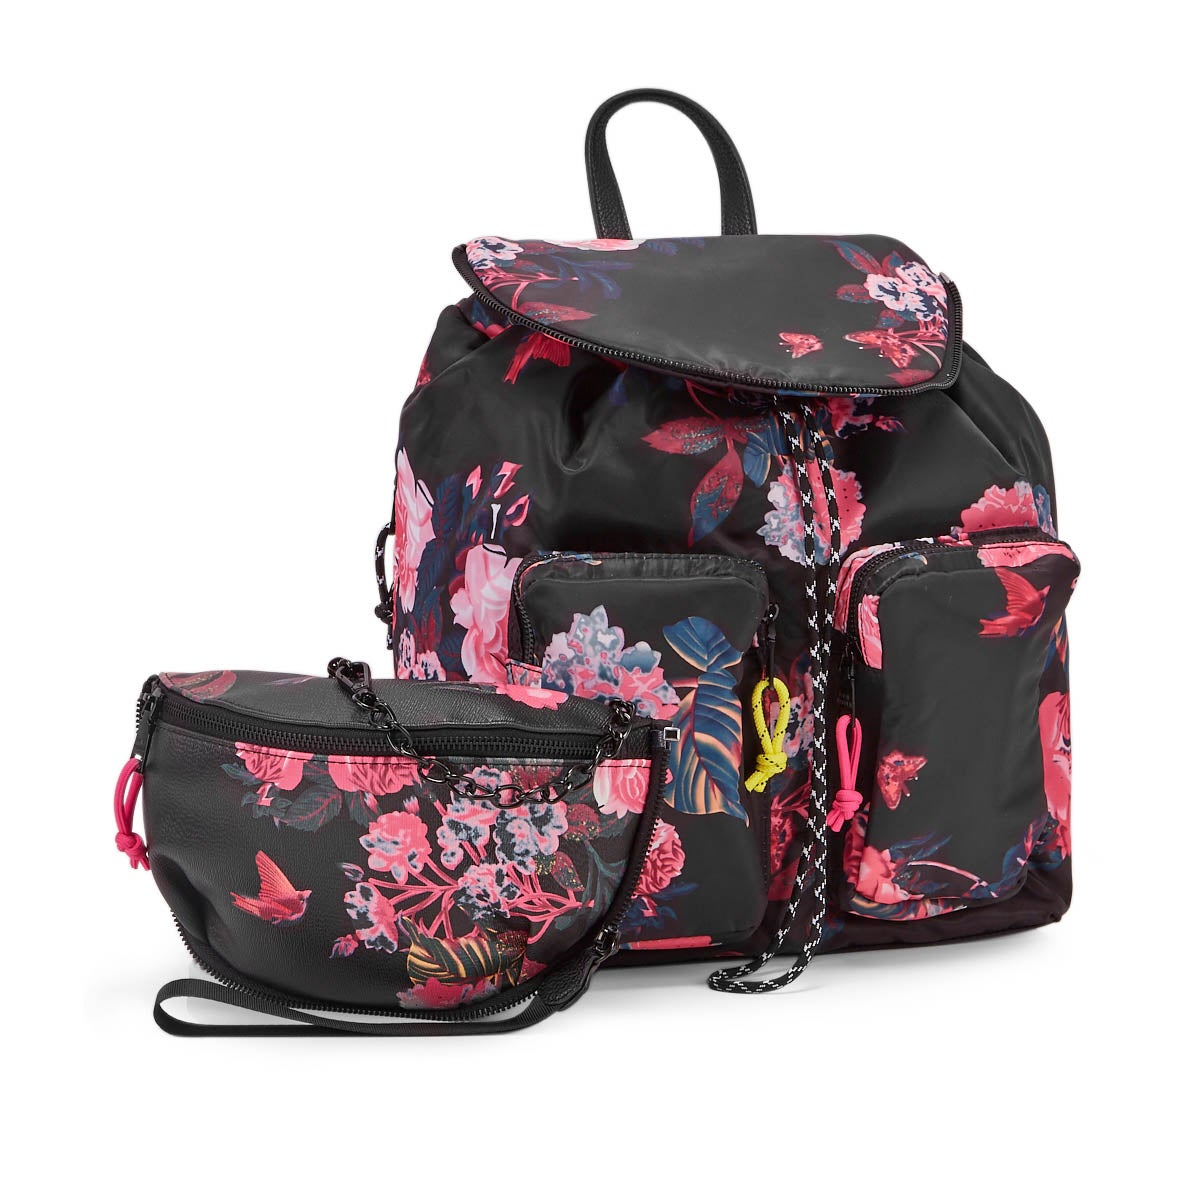 Lds BLily black/floral fashion backpack